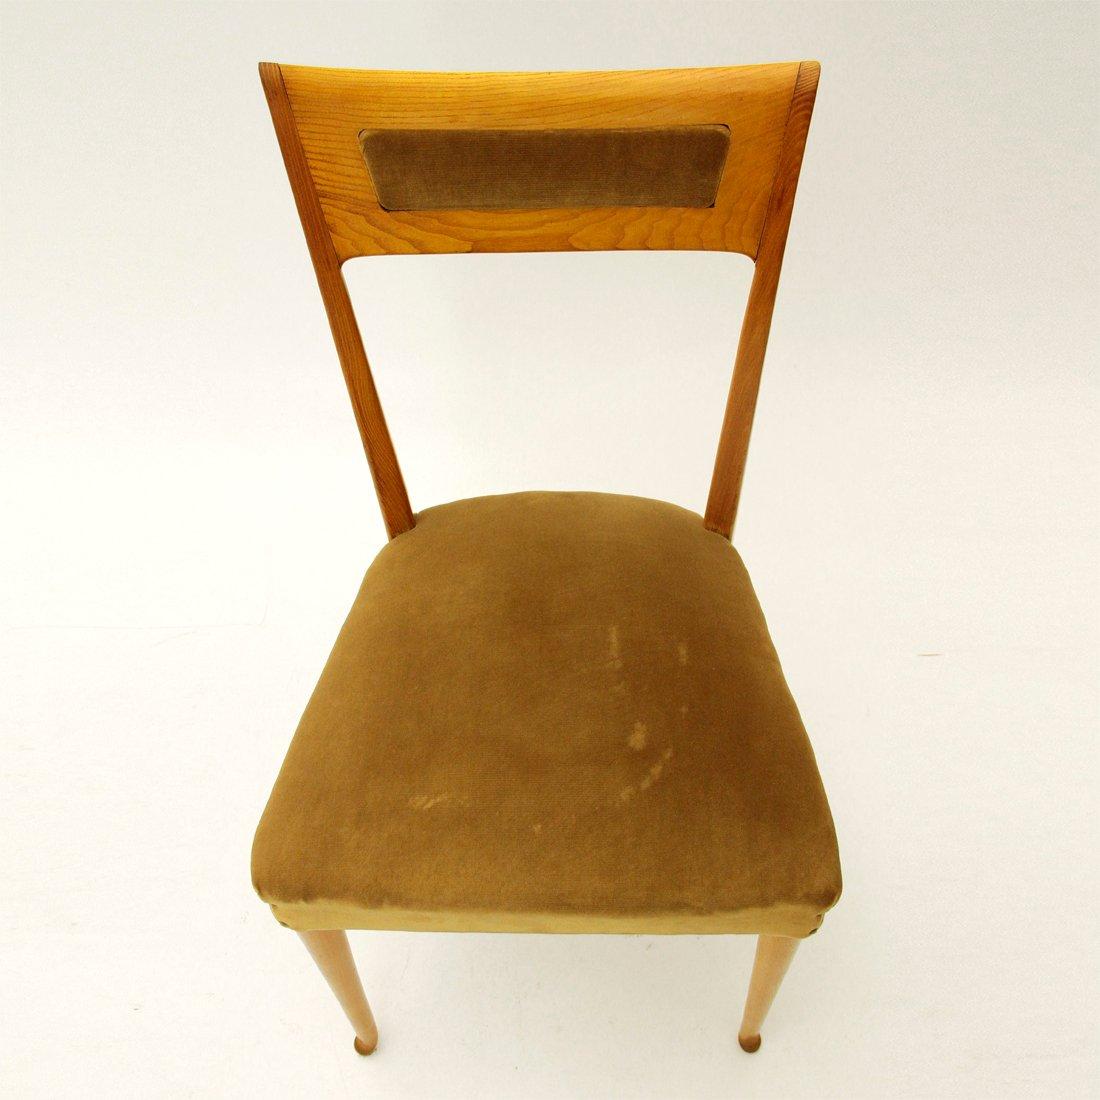 italienische st hle aus holz 1950er 6er set bei pamono kaufen. Black Bedroom Furniture Sets. Home Design Ideas